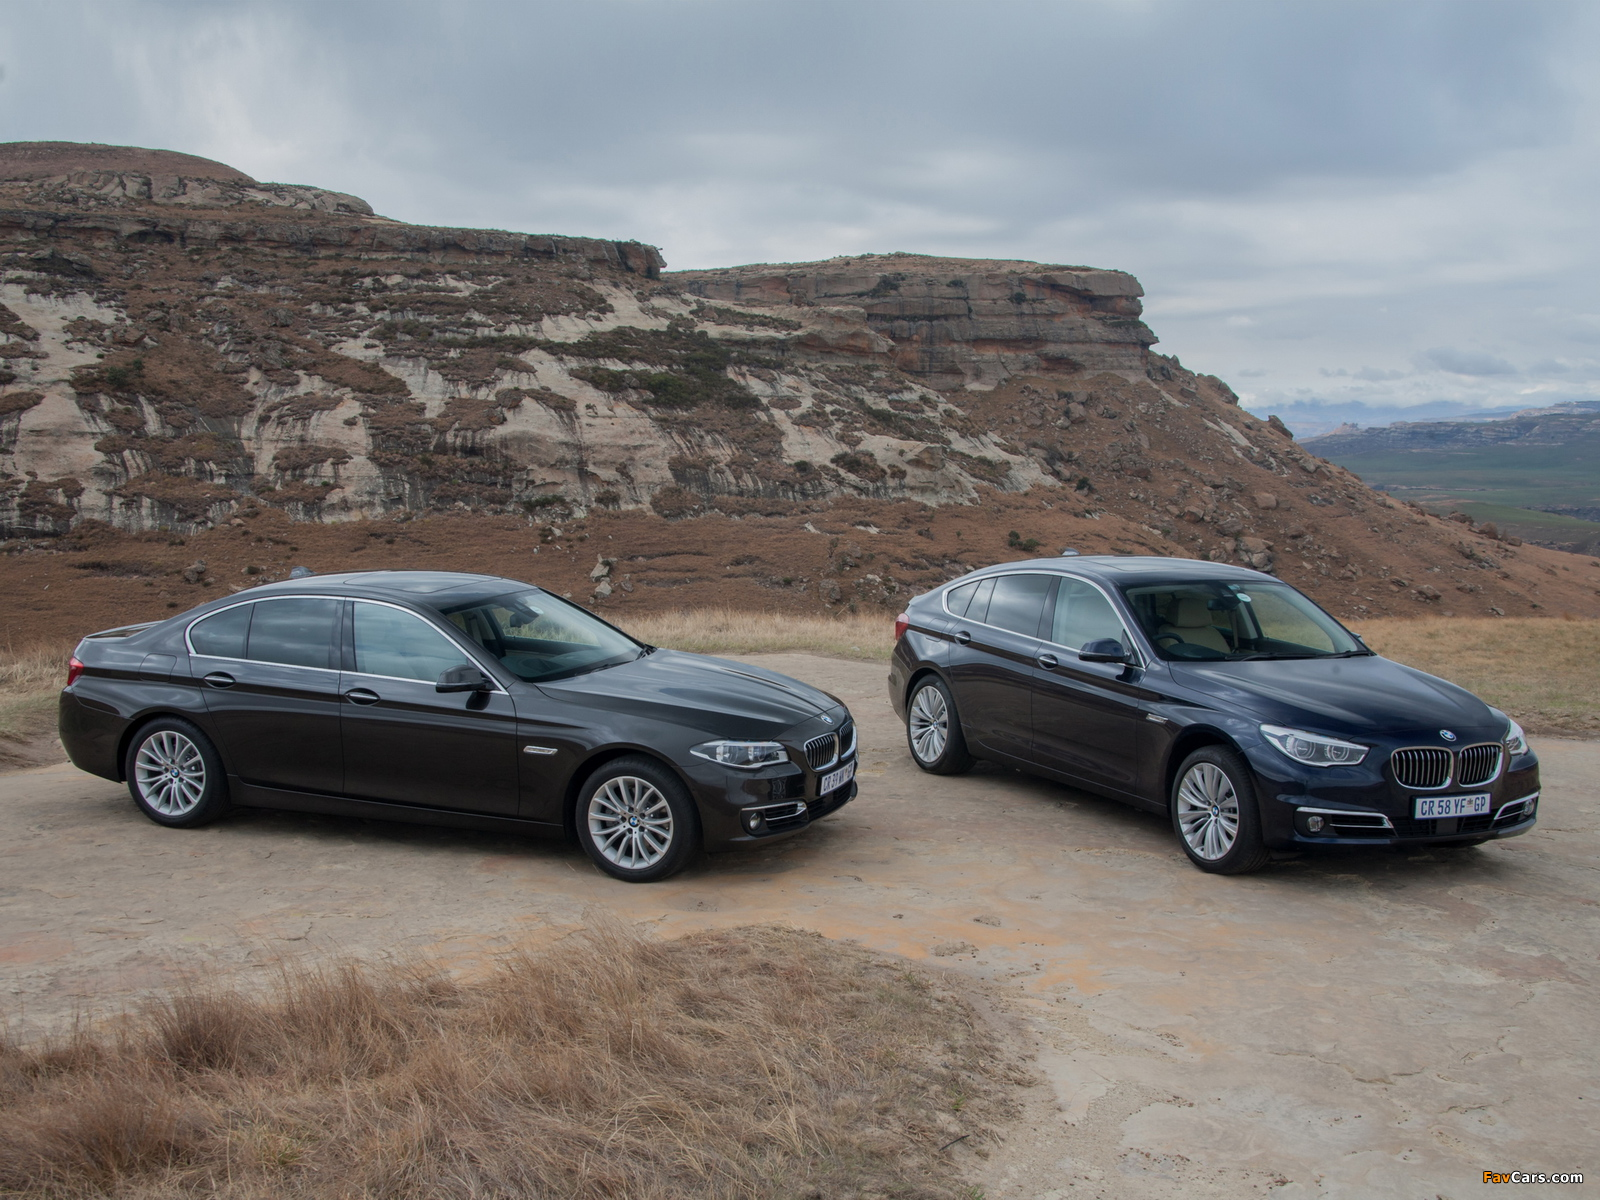 BMW photos (1600 x 1200)